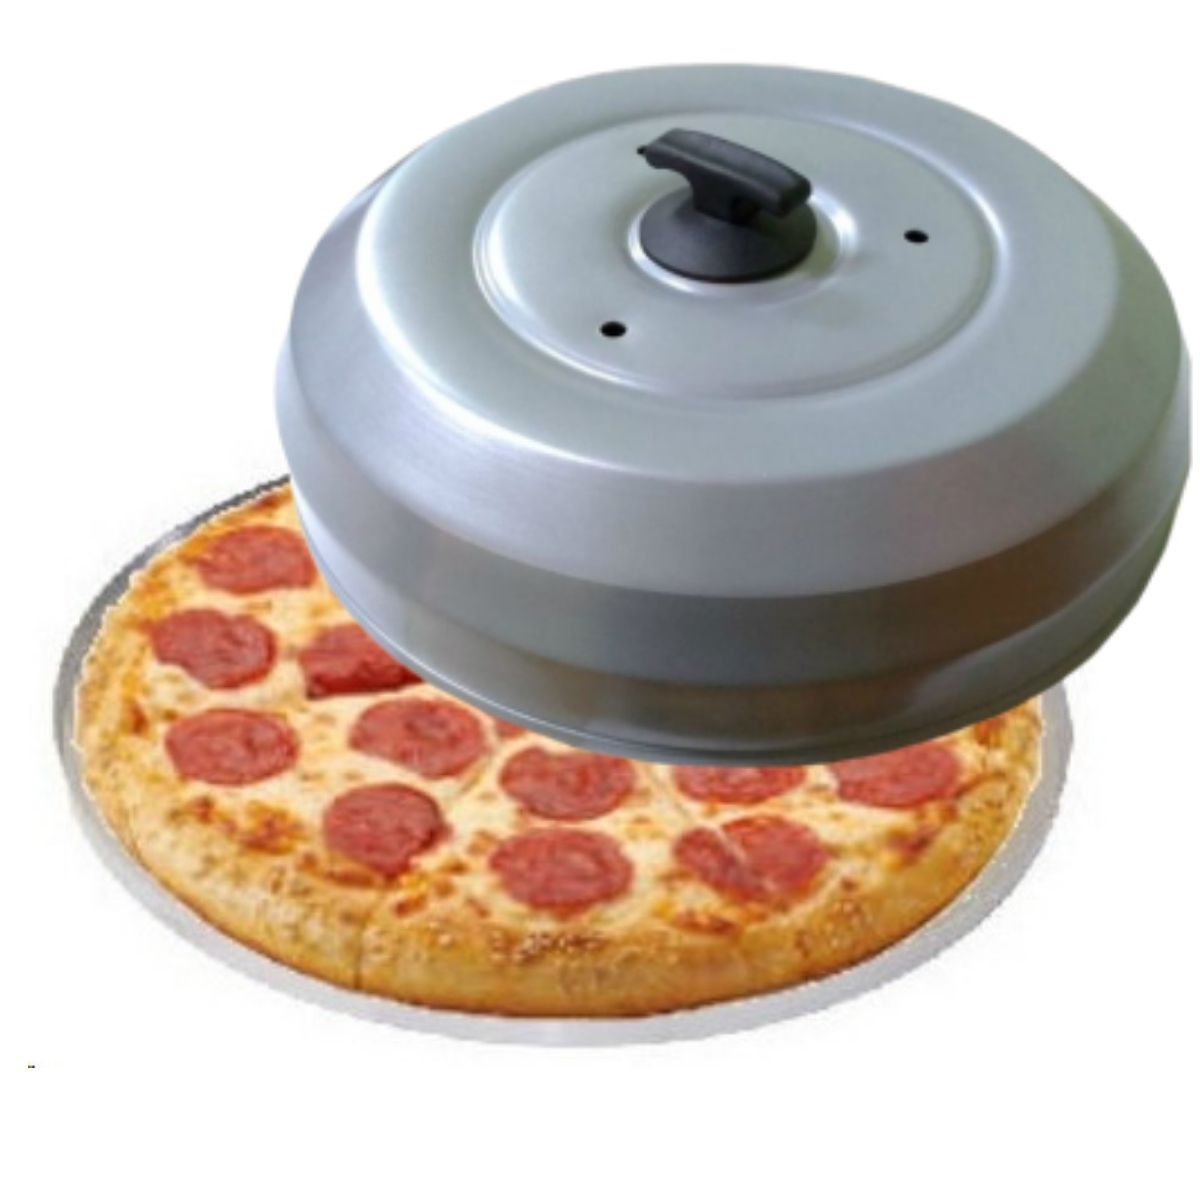 Kit Para Pizza Com Forma De Pizza 35cm Borda Reforçada E Abafador De Pizza E Churrasco Cinza Grande - Gallizzi